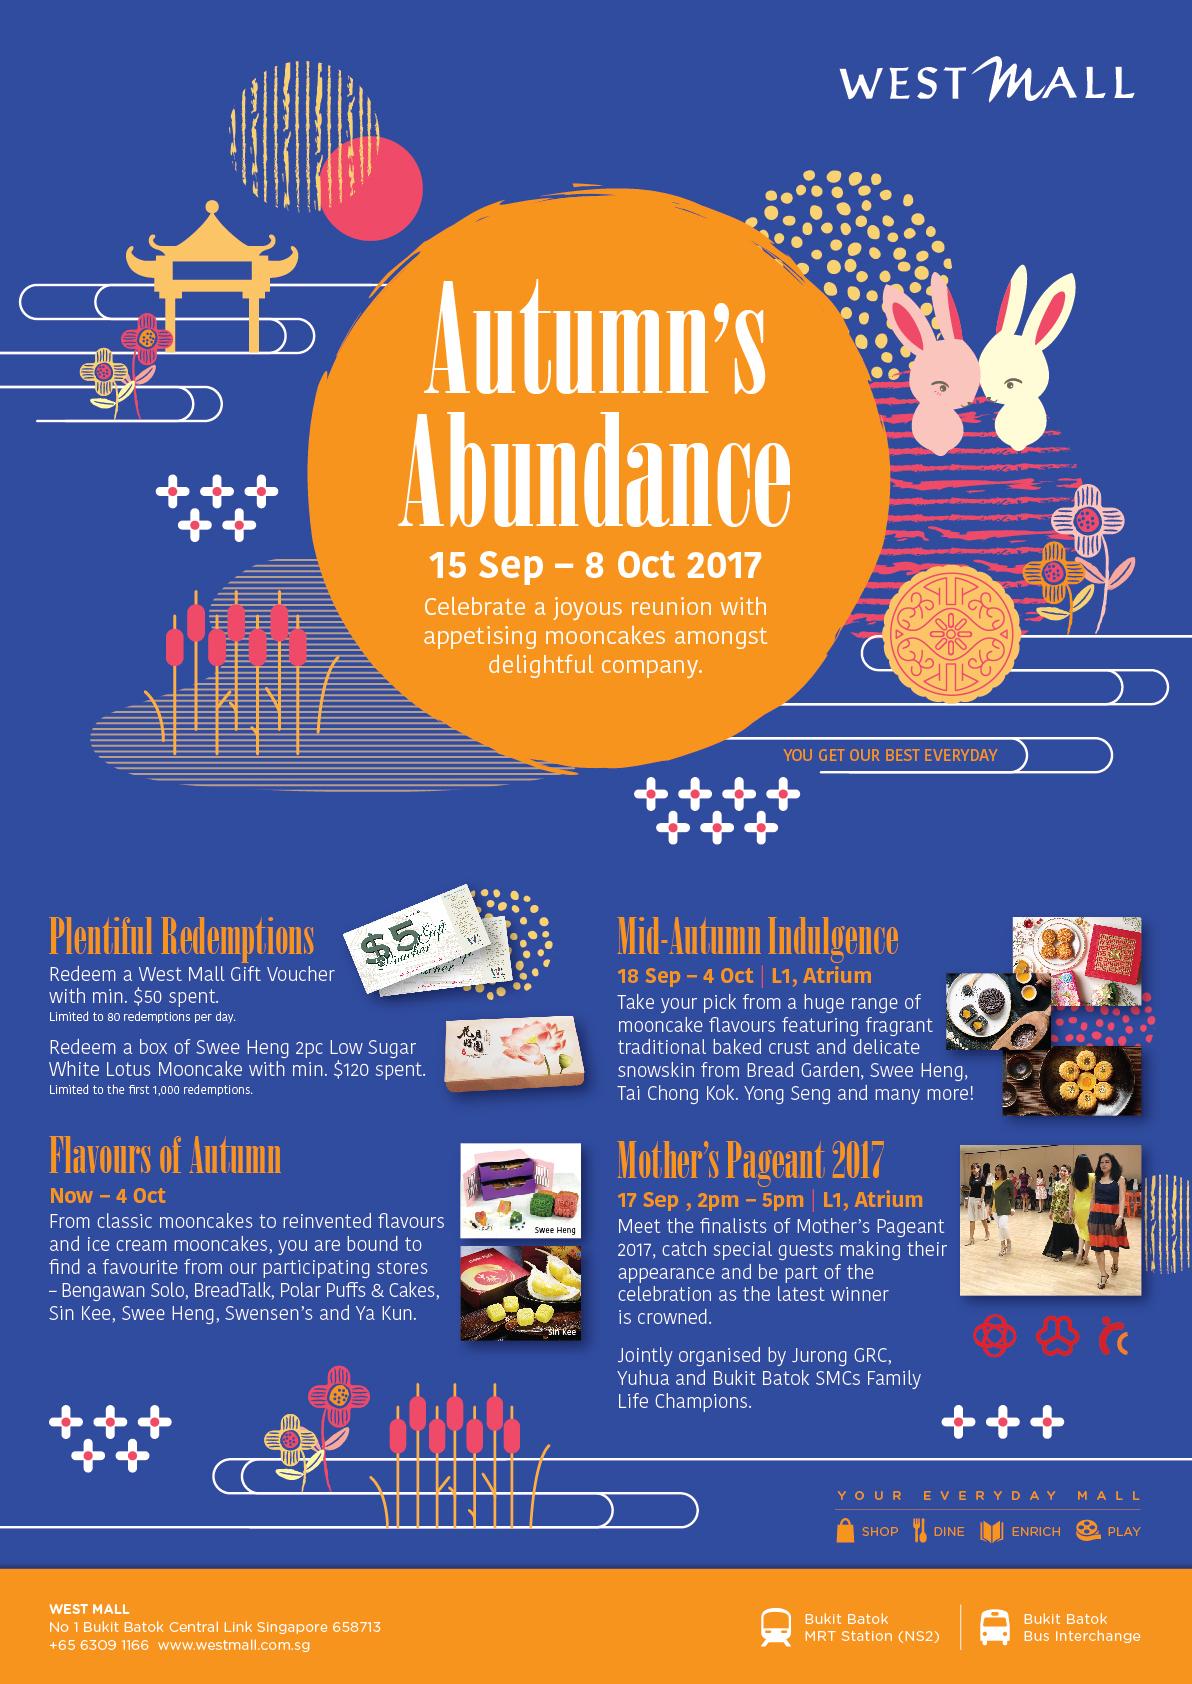 Autumn's Abundance